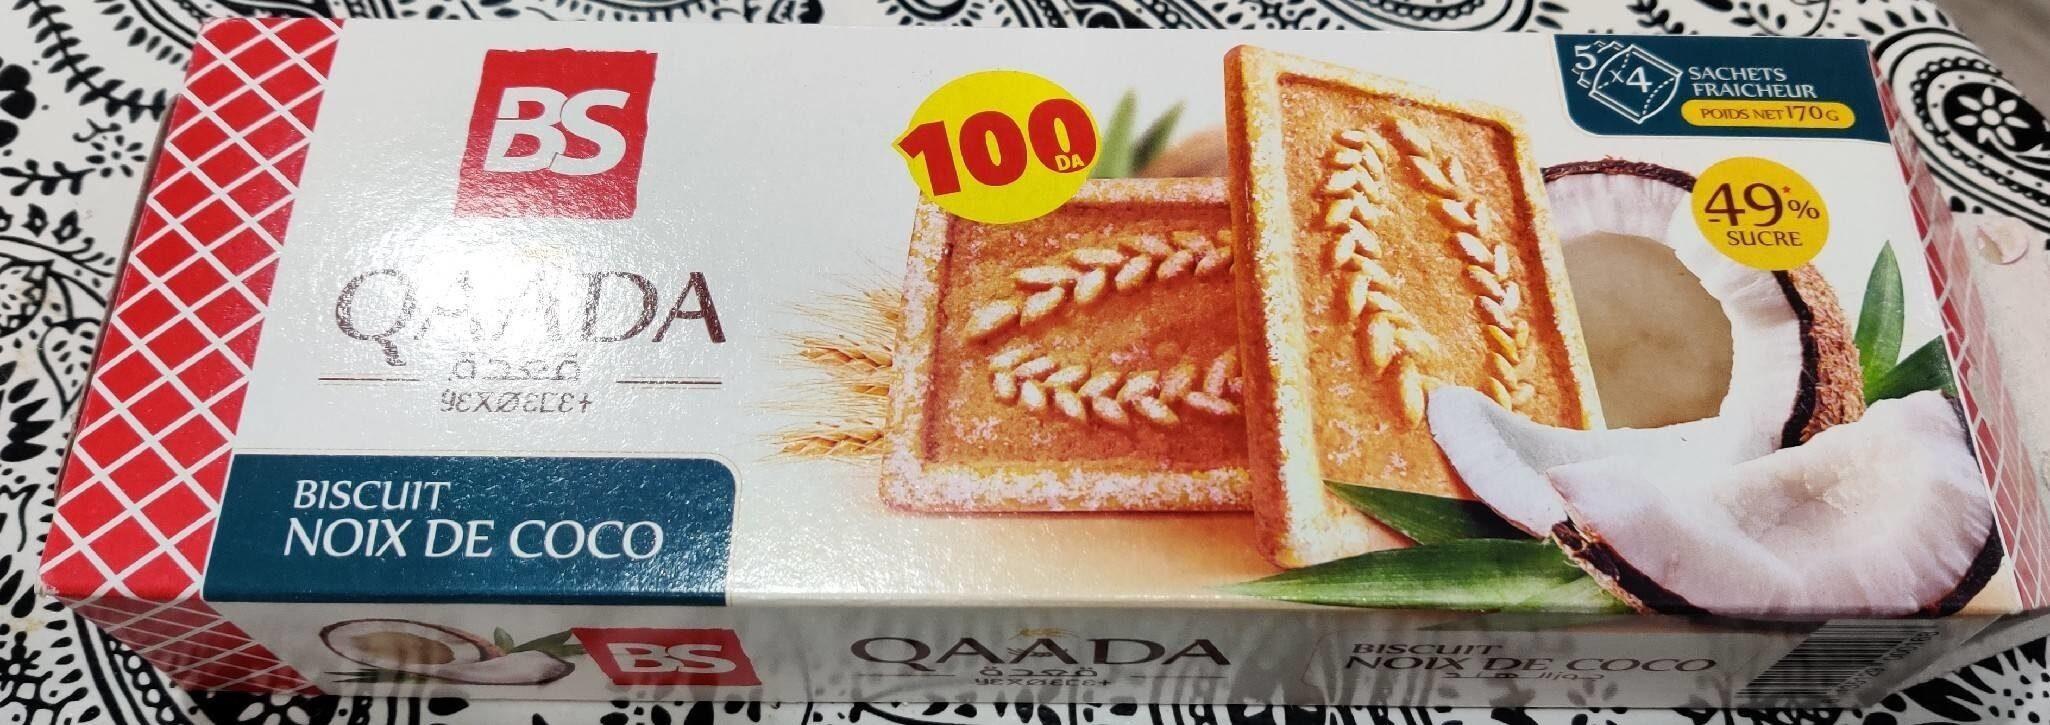 Biscuit noix de coco - نتاج - fr